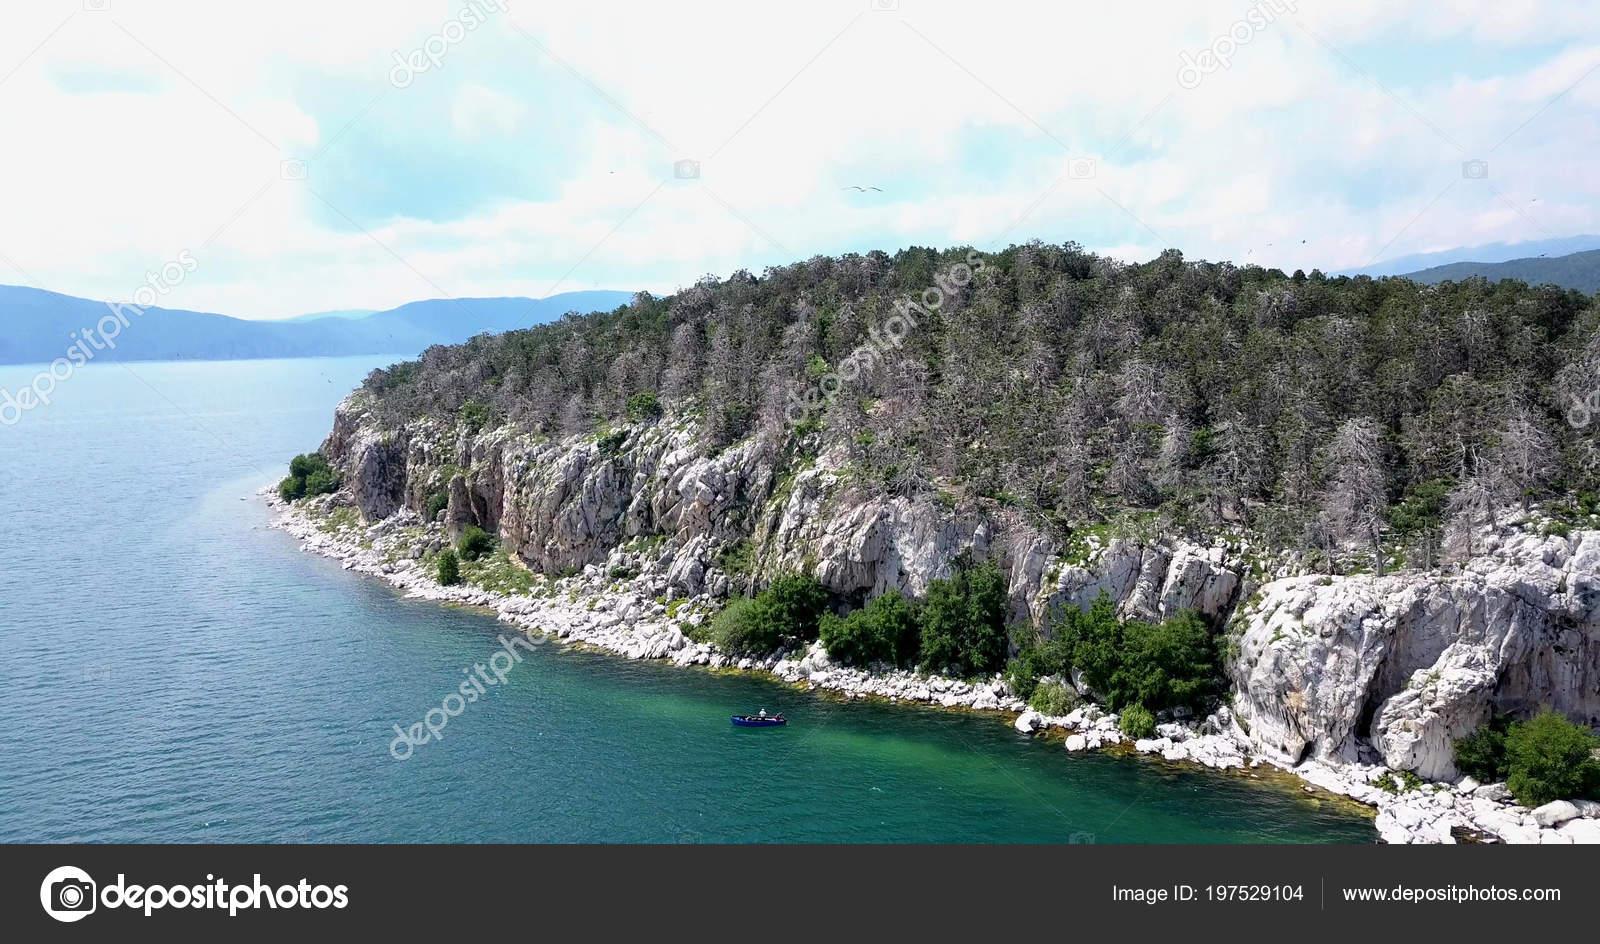 golem island